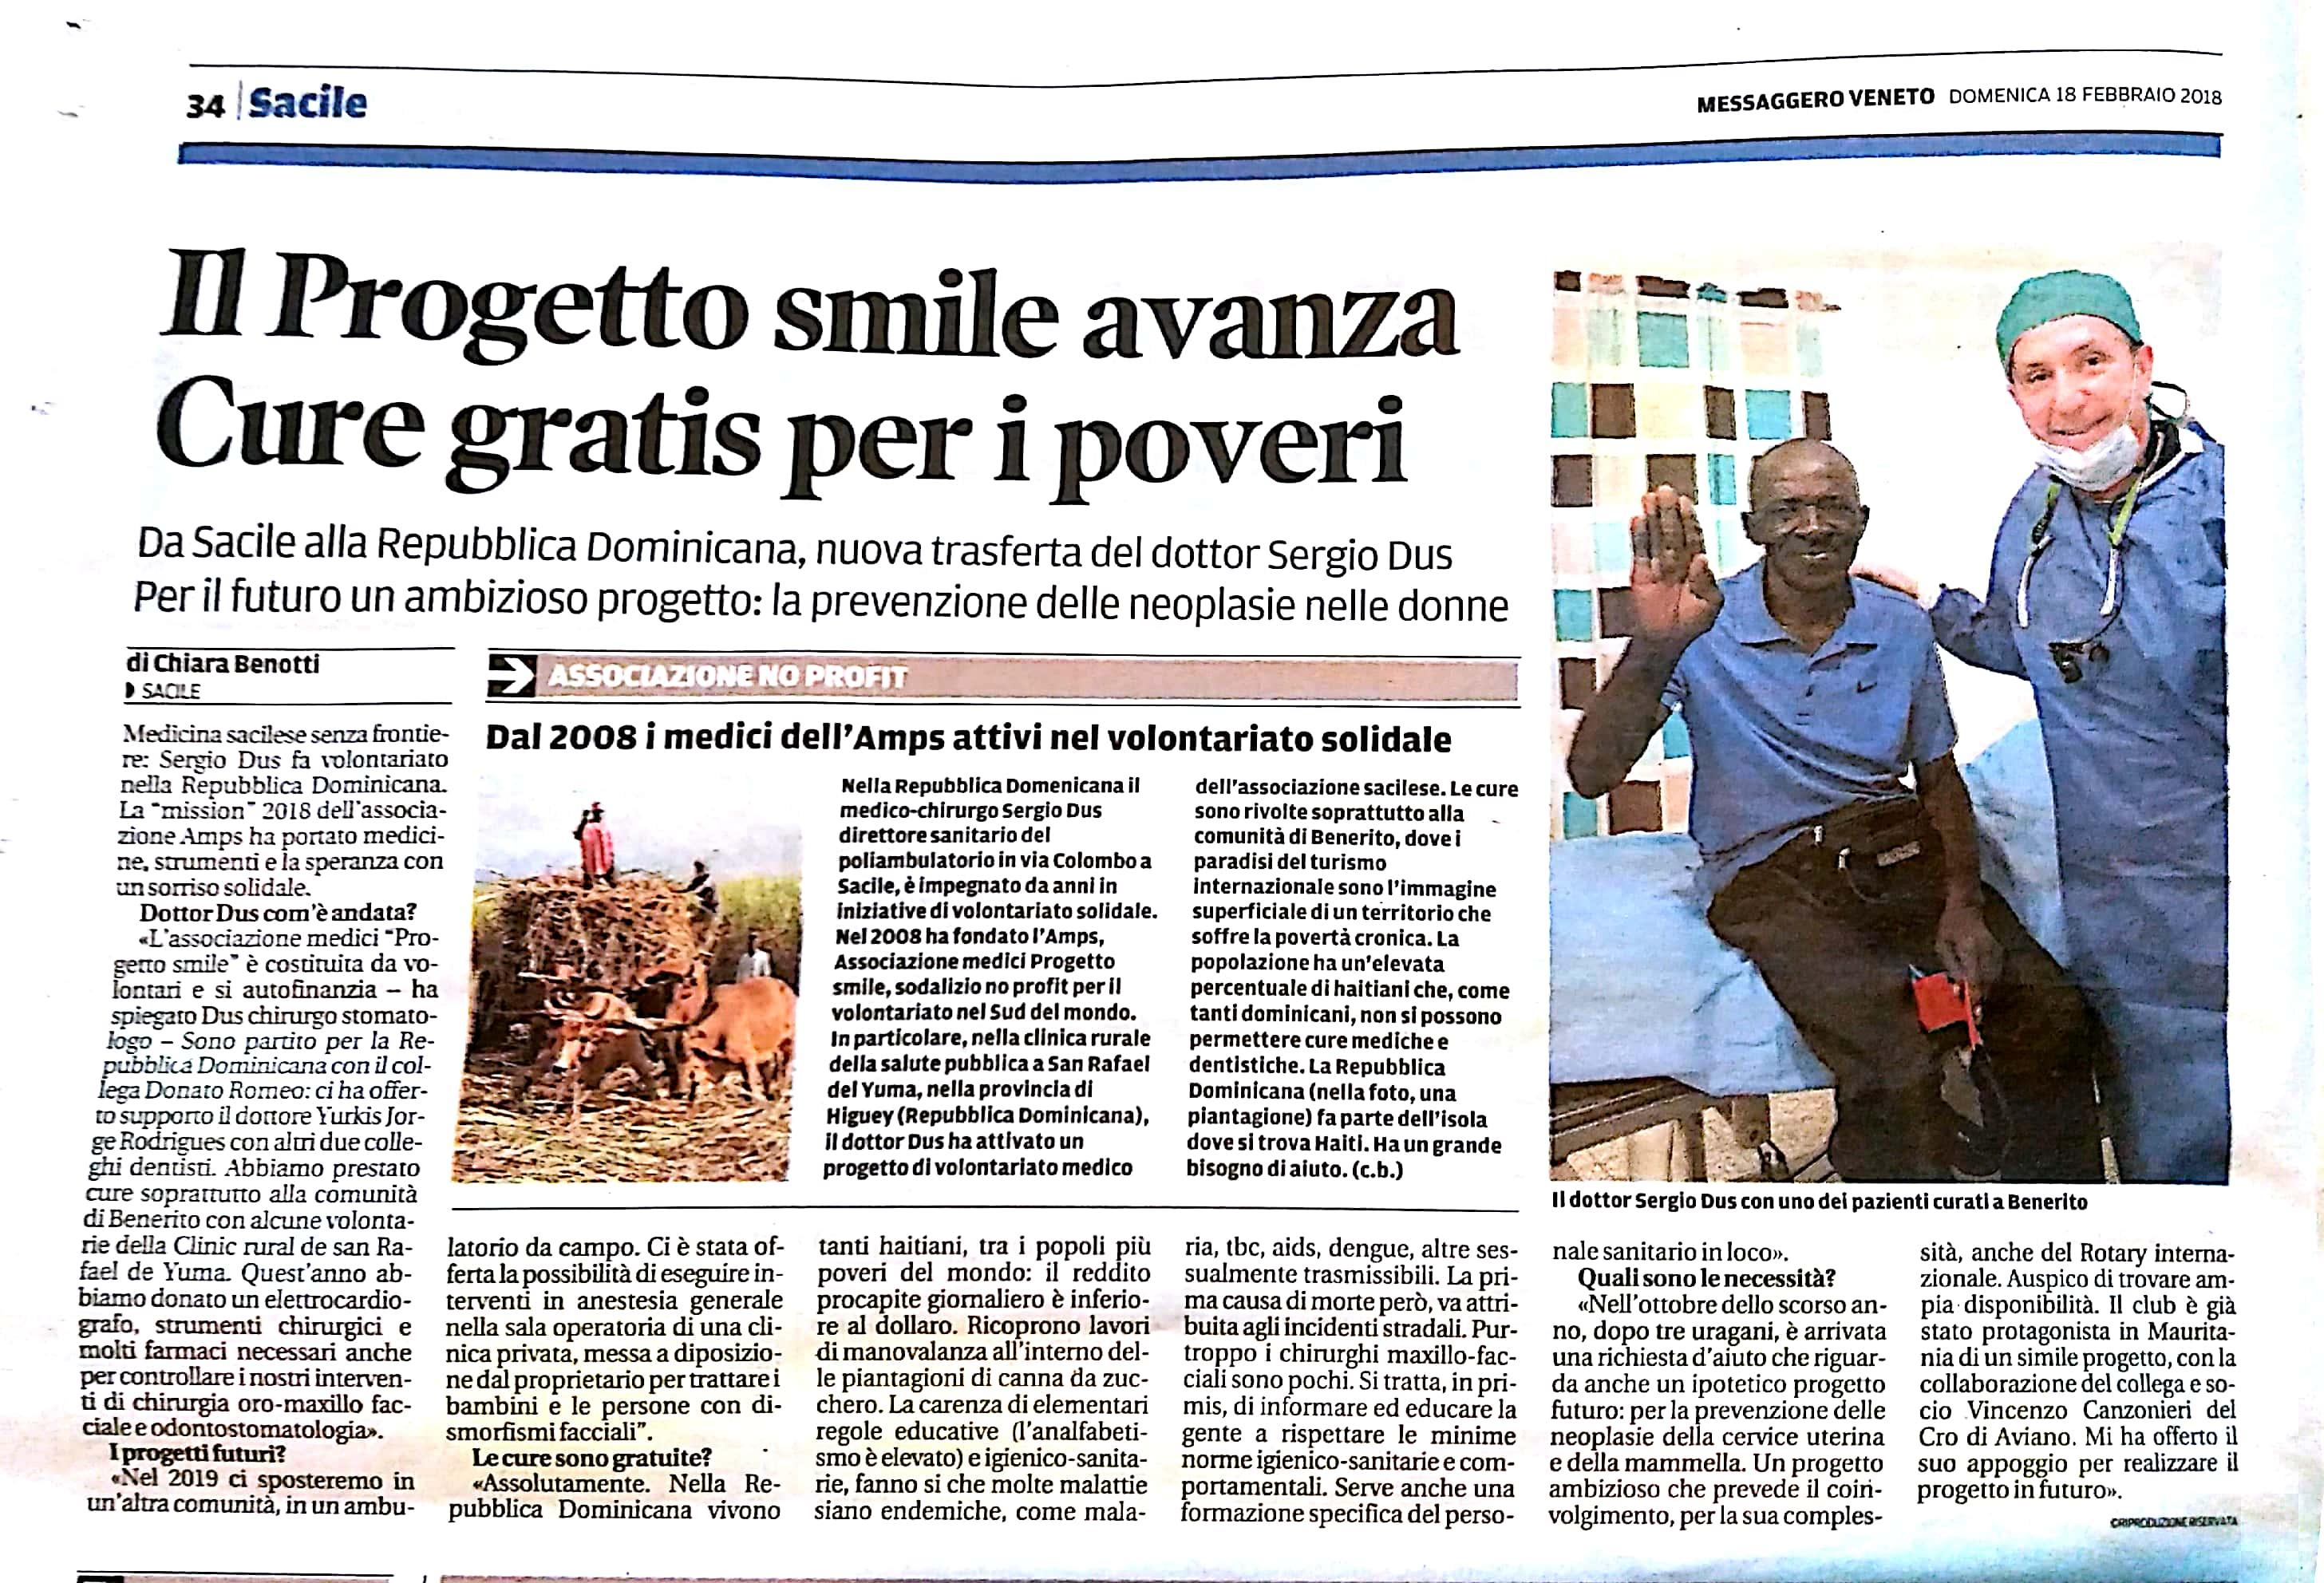 Messaggero Veneto 18.02.2018